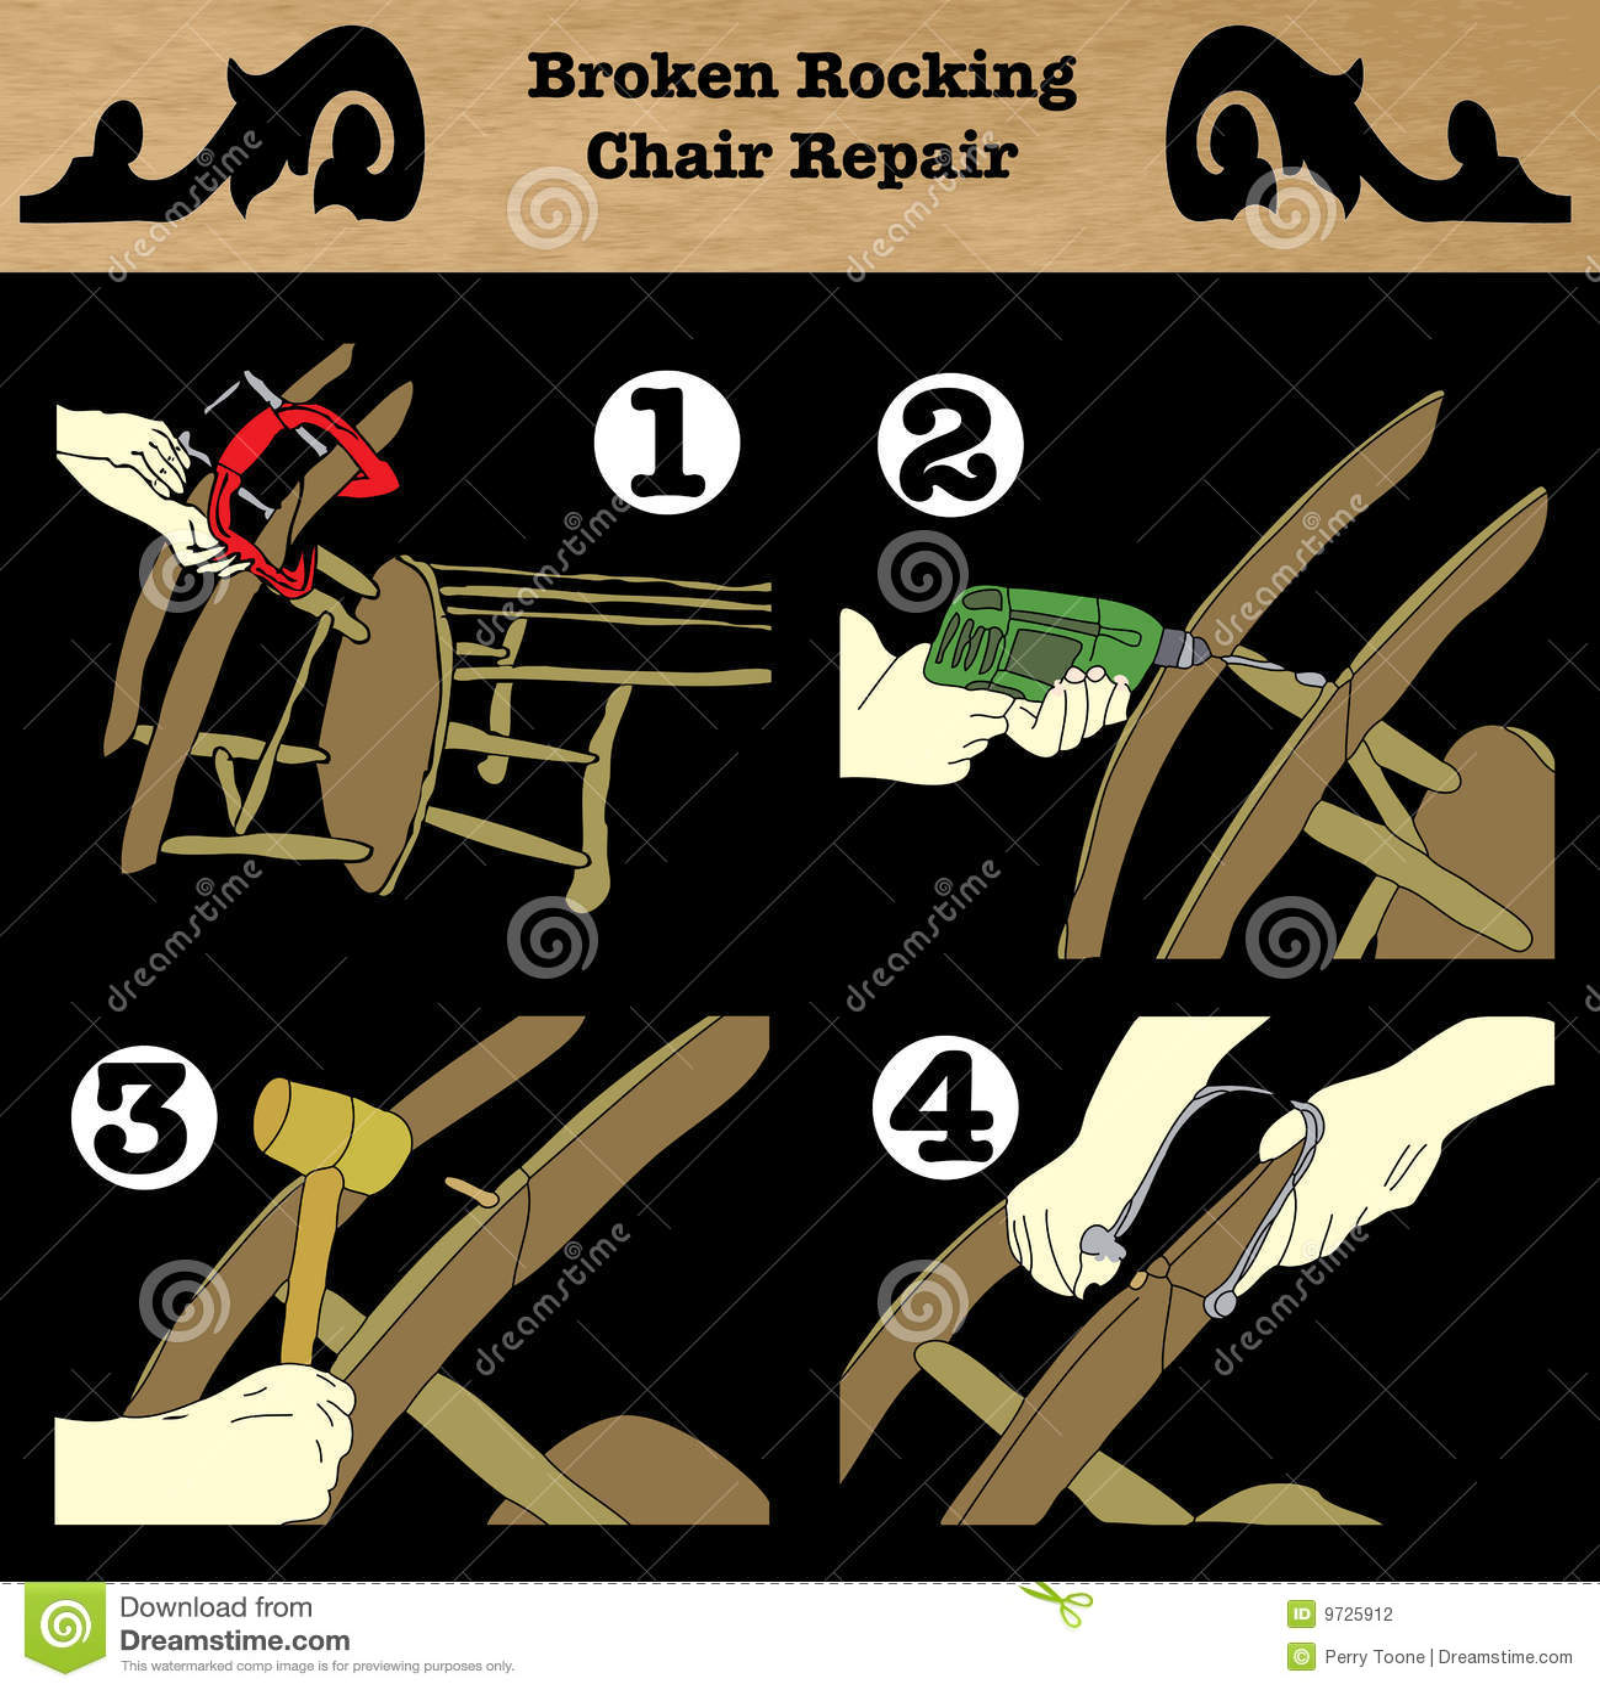 Miraculous Broken Rocking Chair Repair Stock Illustration Machost Co Dining Chair Design Ideas Machostcouk